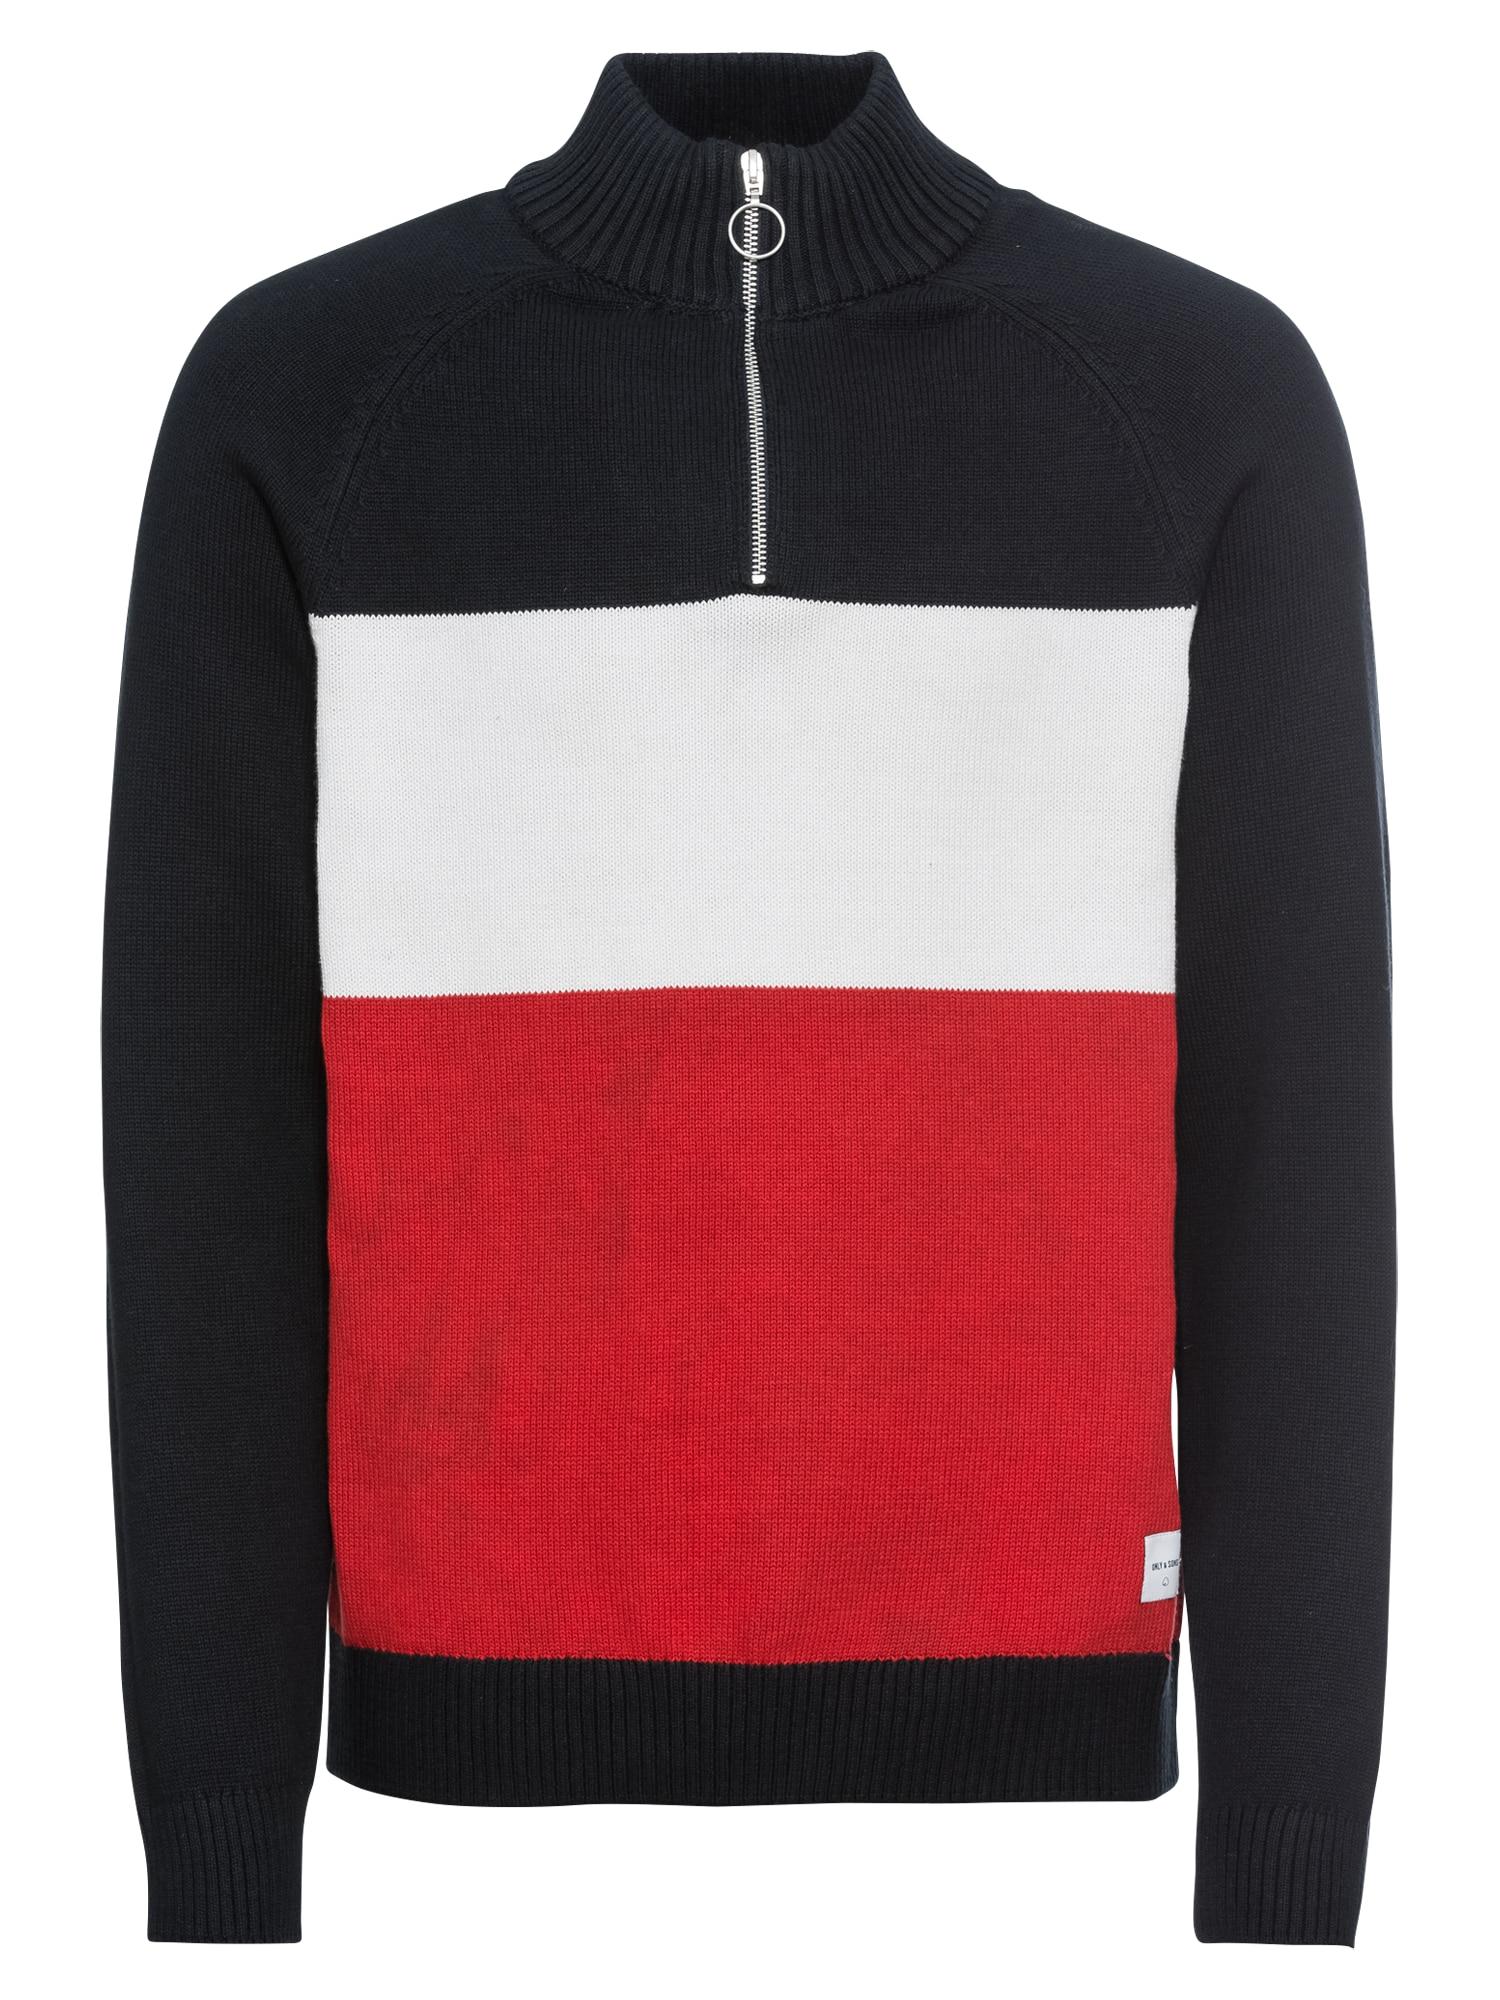 Svetr Clark námořnická modř červená bílá Only & Sons